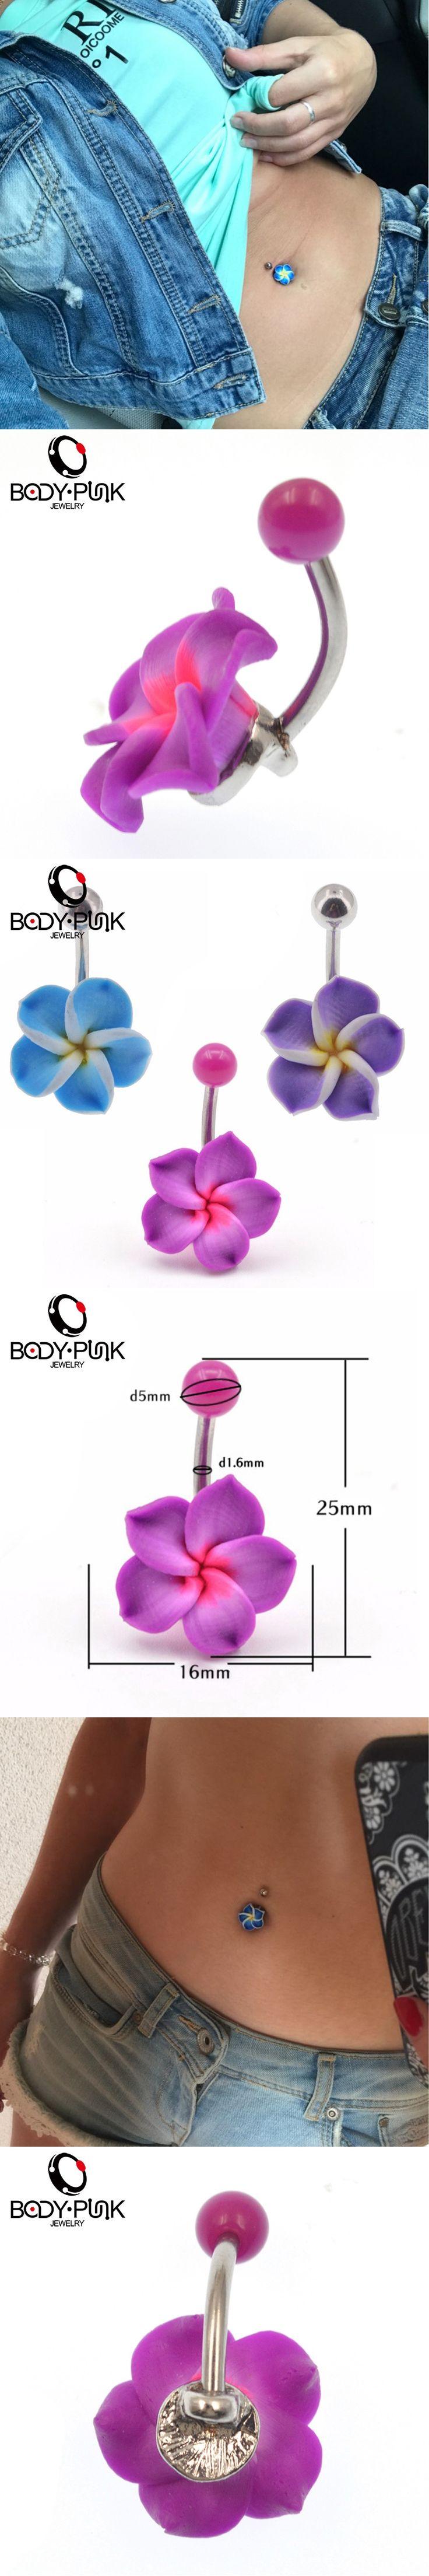 Belly Button Rings New Arrival  body jewelry 1 Pcs Purple Flowers Soft Clay Piercings Jewelry Navel piercing ombligo nombril